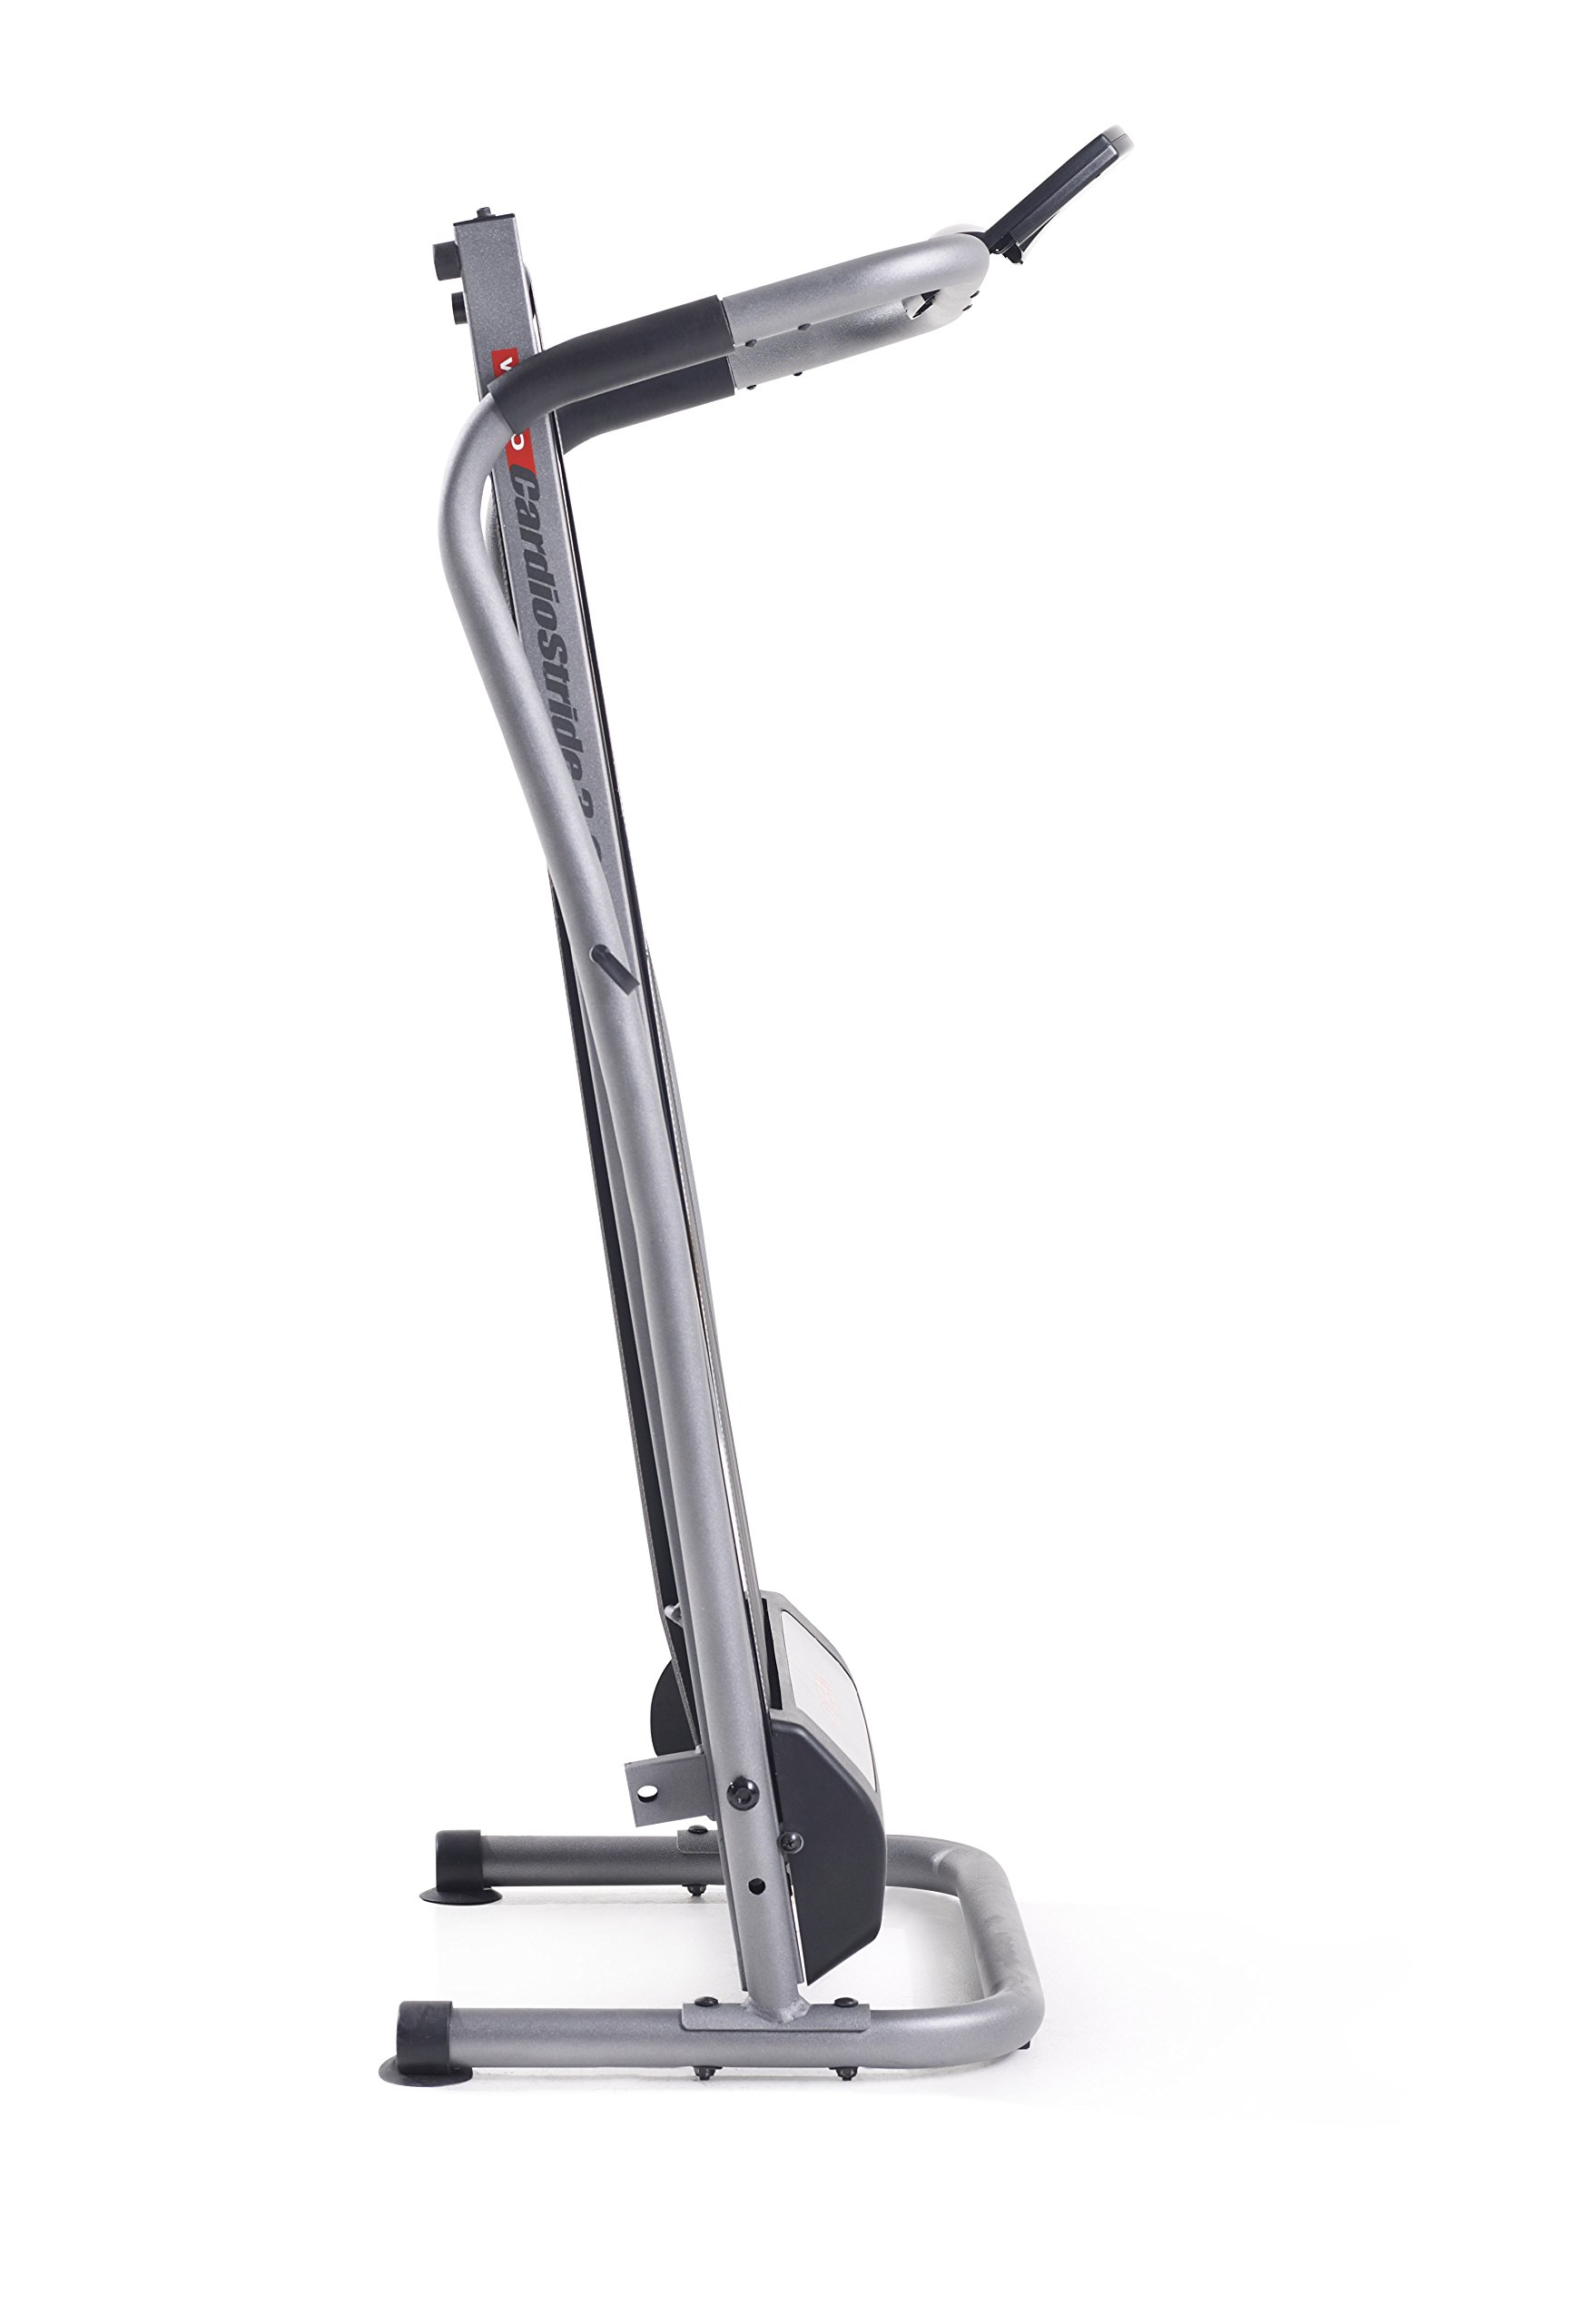 Weslo WLTL99315 CardioStride 3.0 Treadmill by Weslo (Image #2)